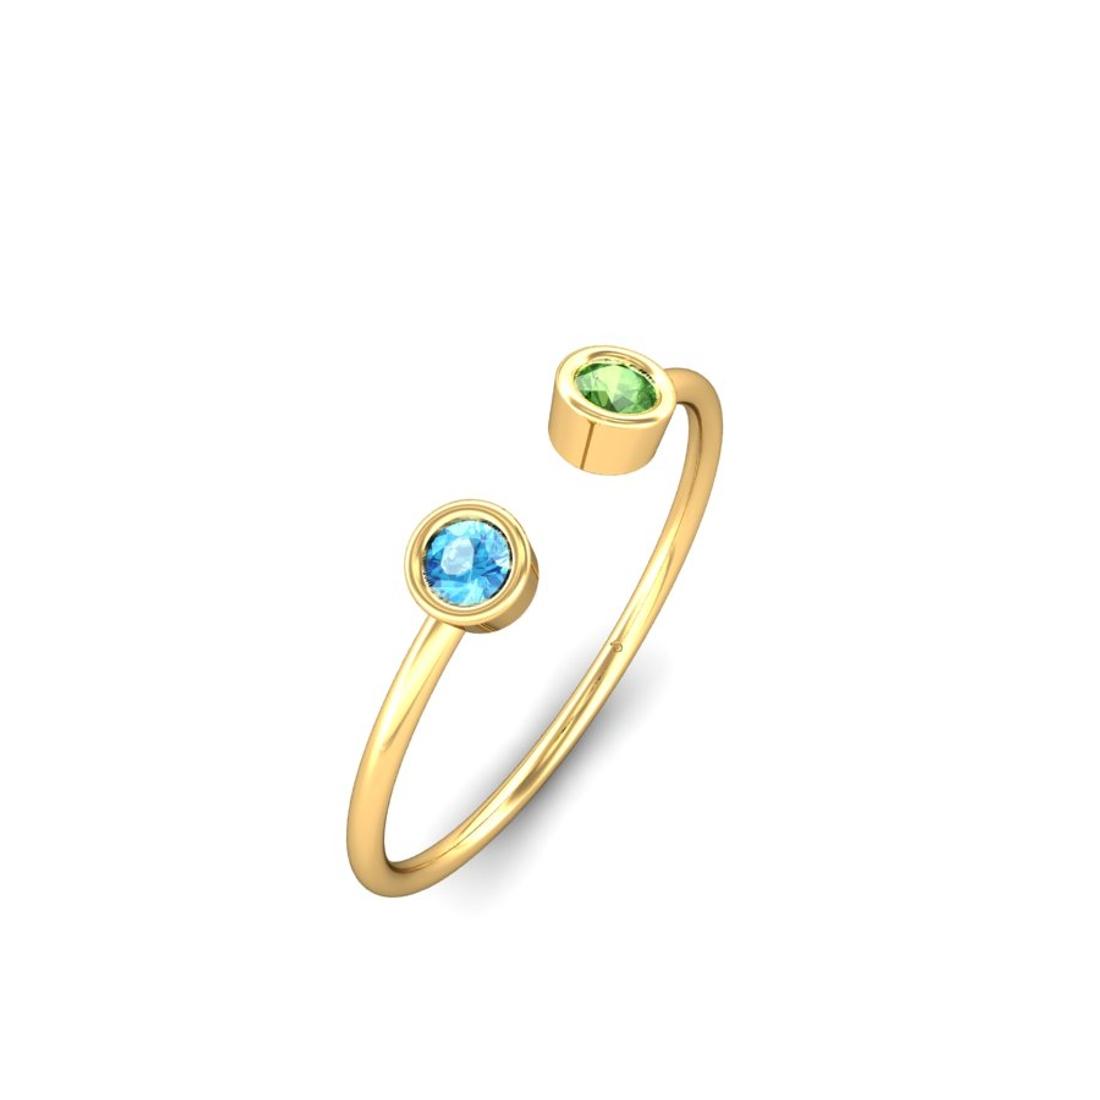 Jewel samarth 18k(750) BIS Hallmark Yellow Gold Poles Apart Blue Topz & Tourmaline Ring (CGL Certified)